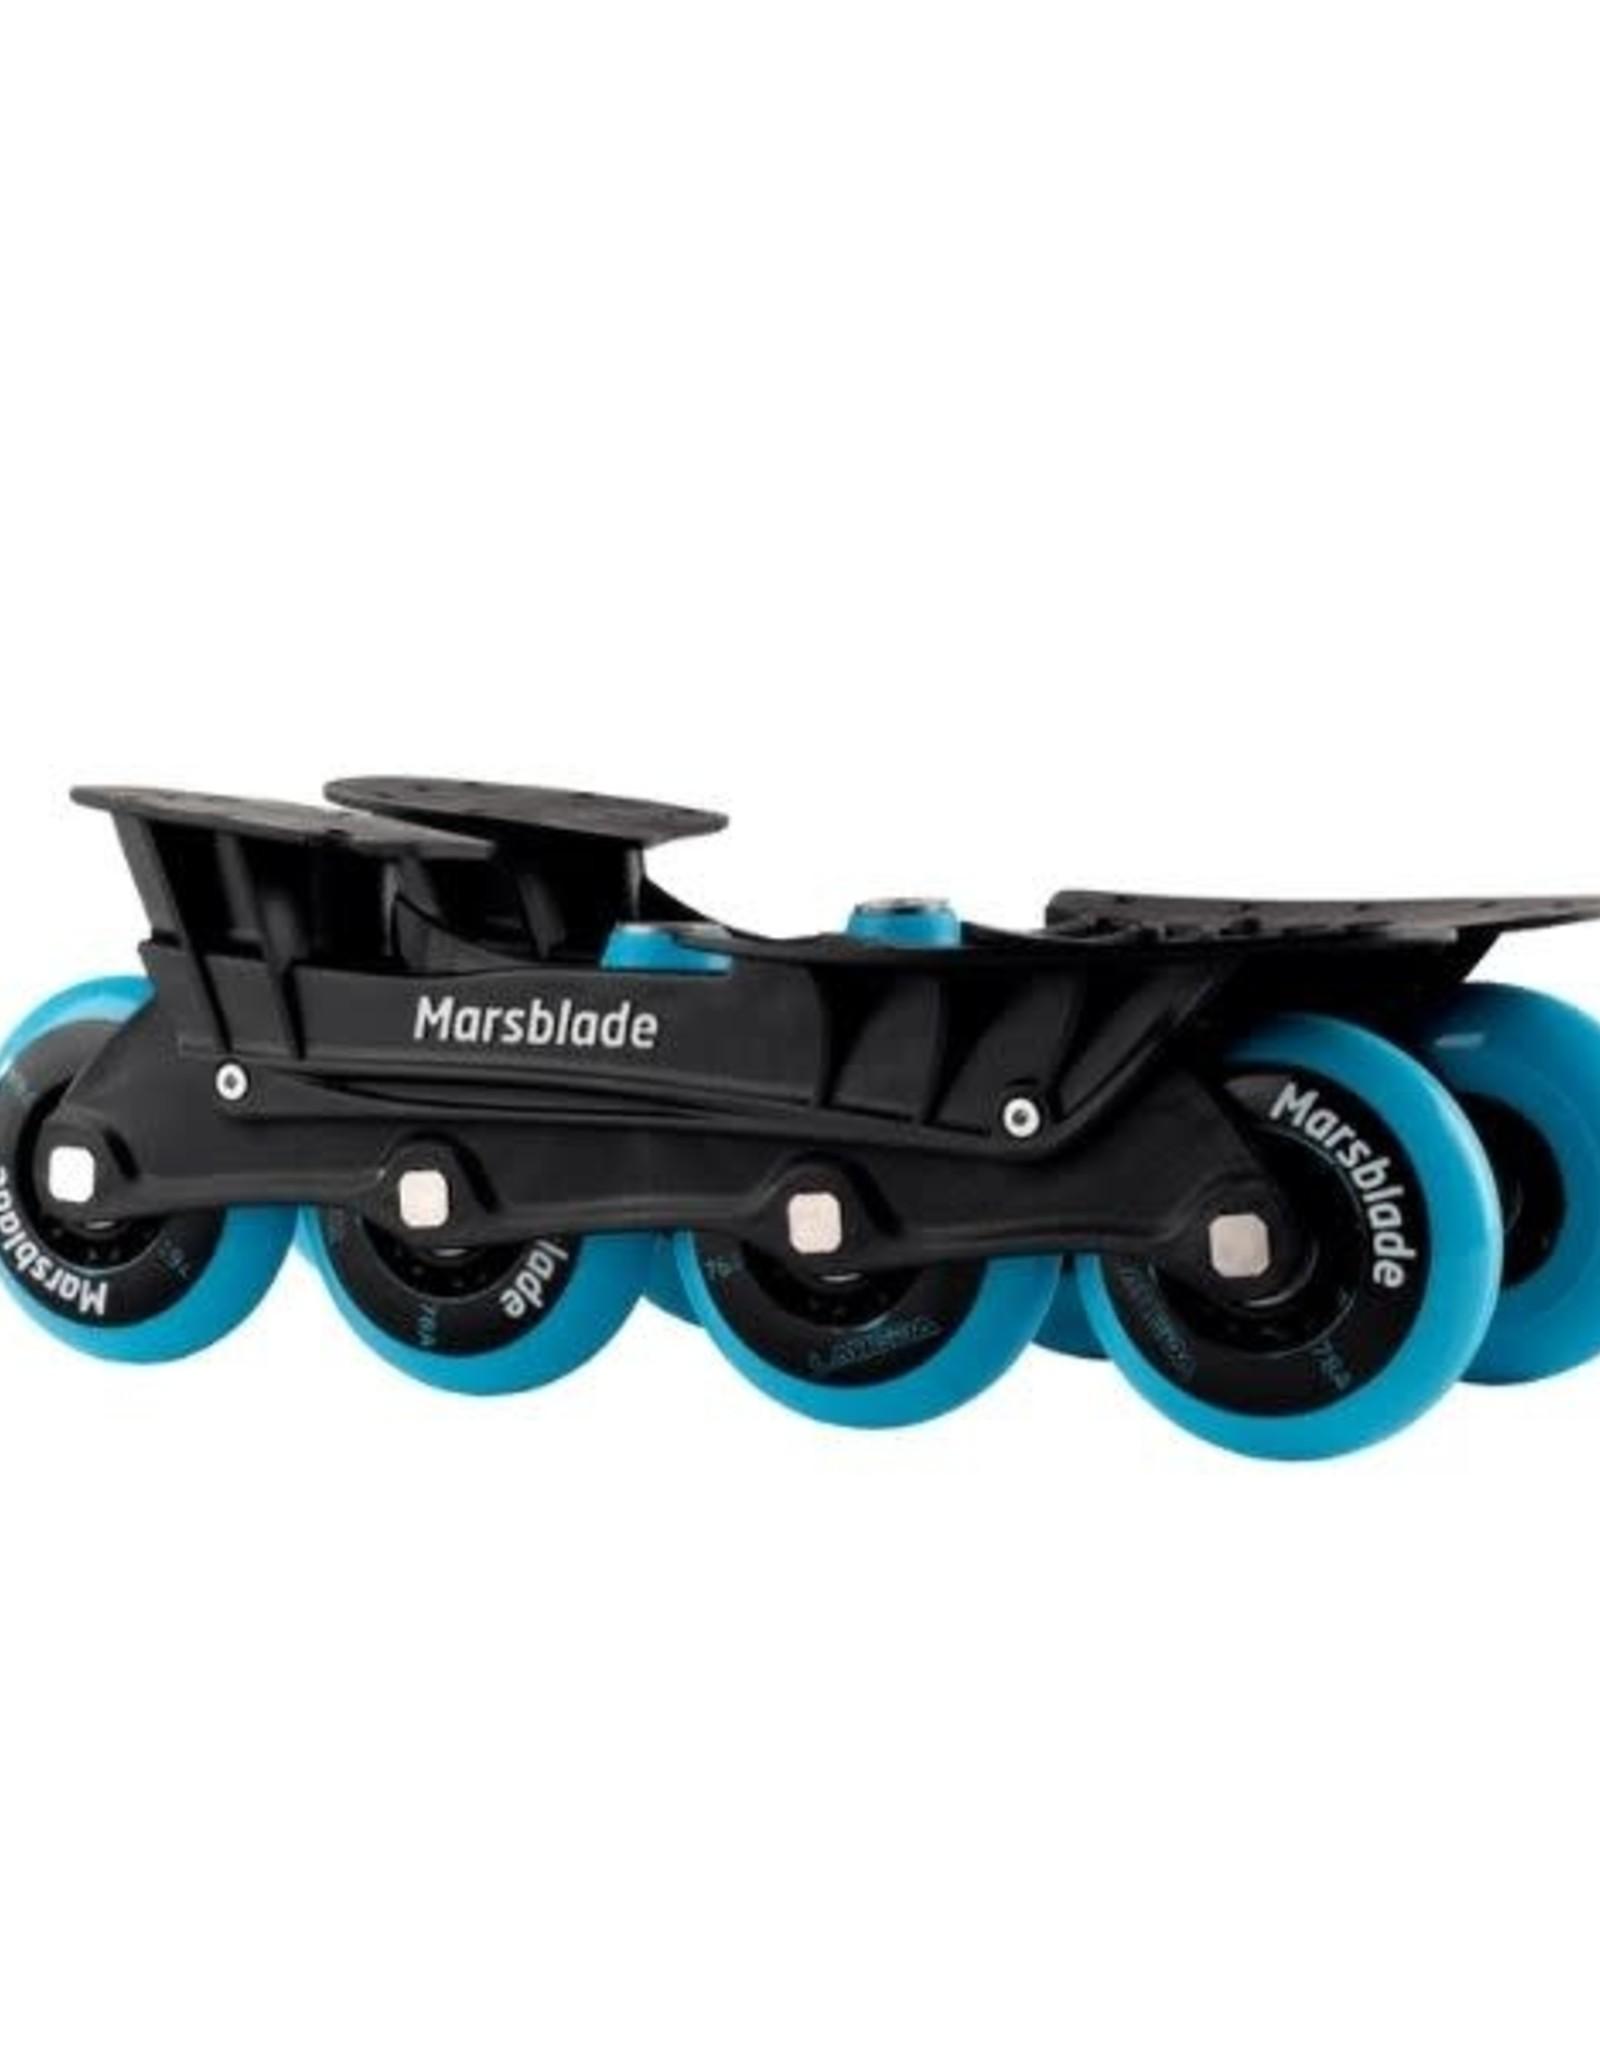 Marsblade Marsblade O1 Kit (Off-Ice)